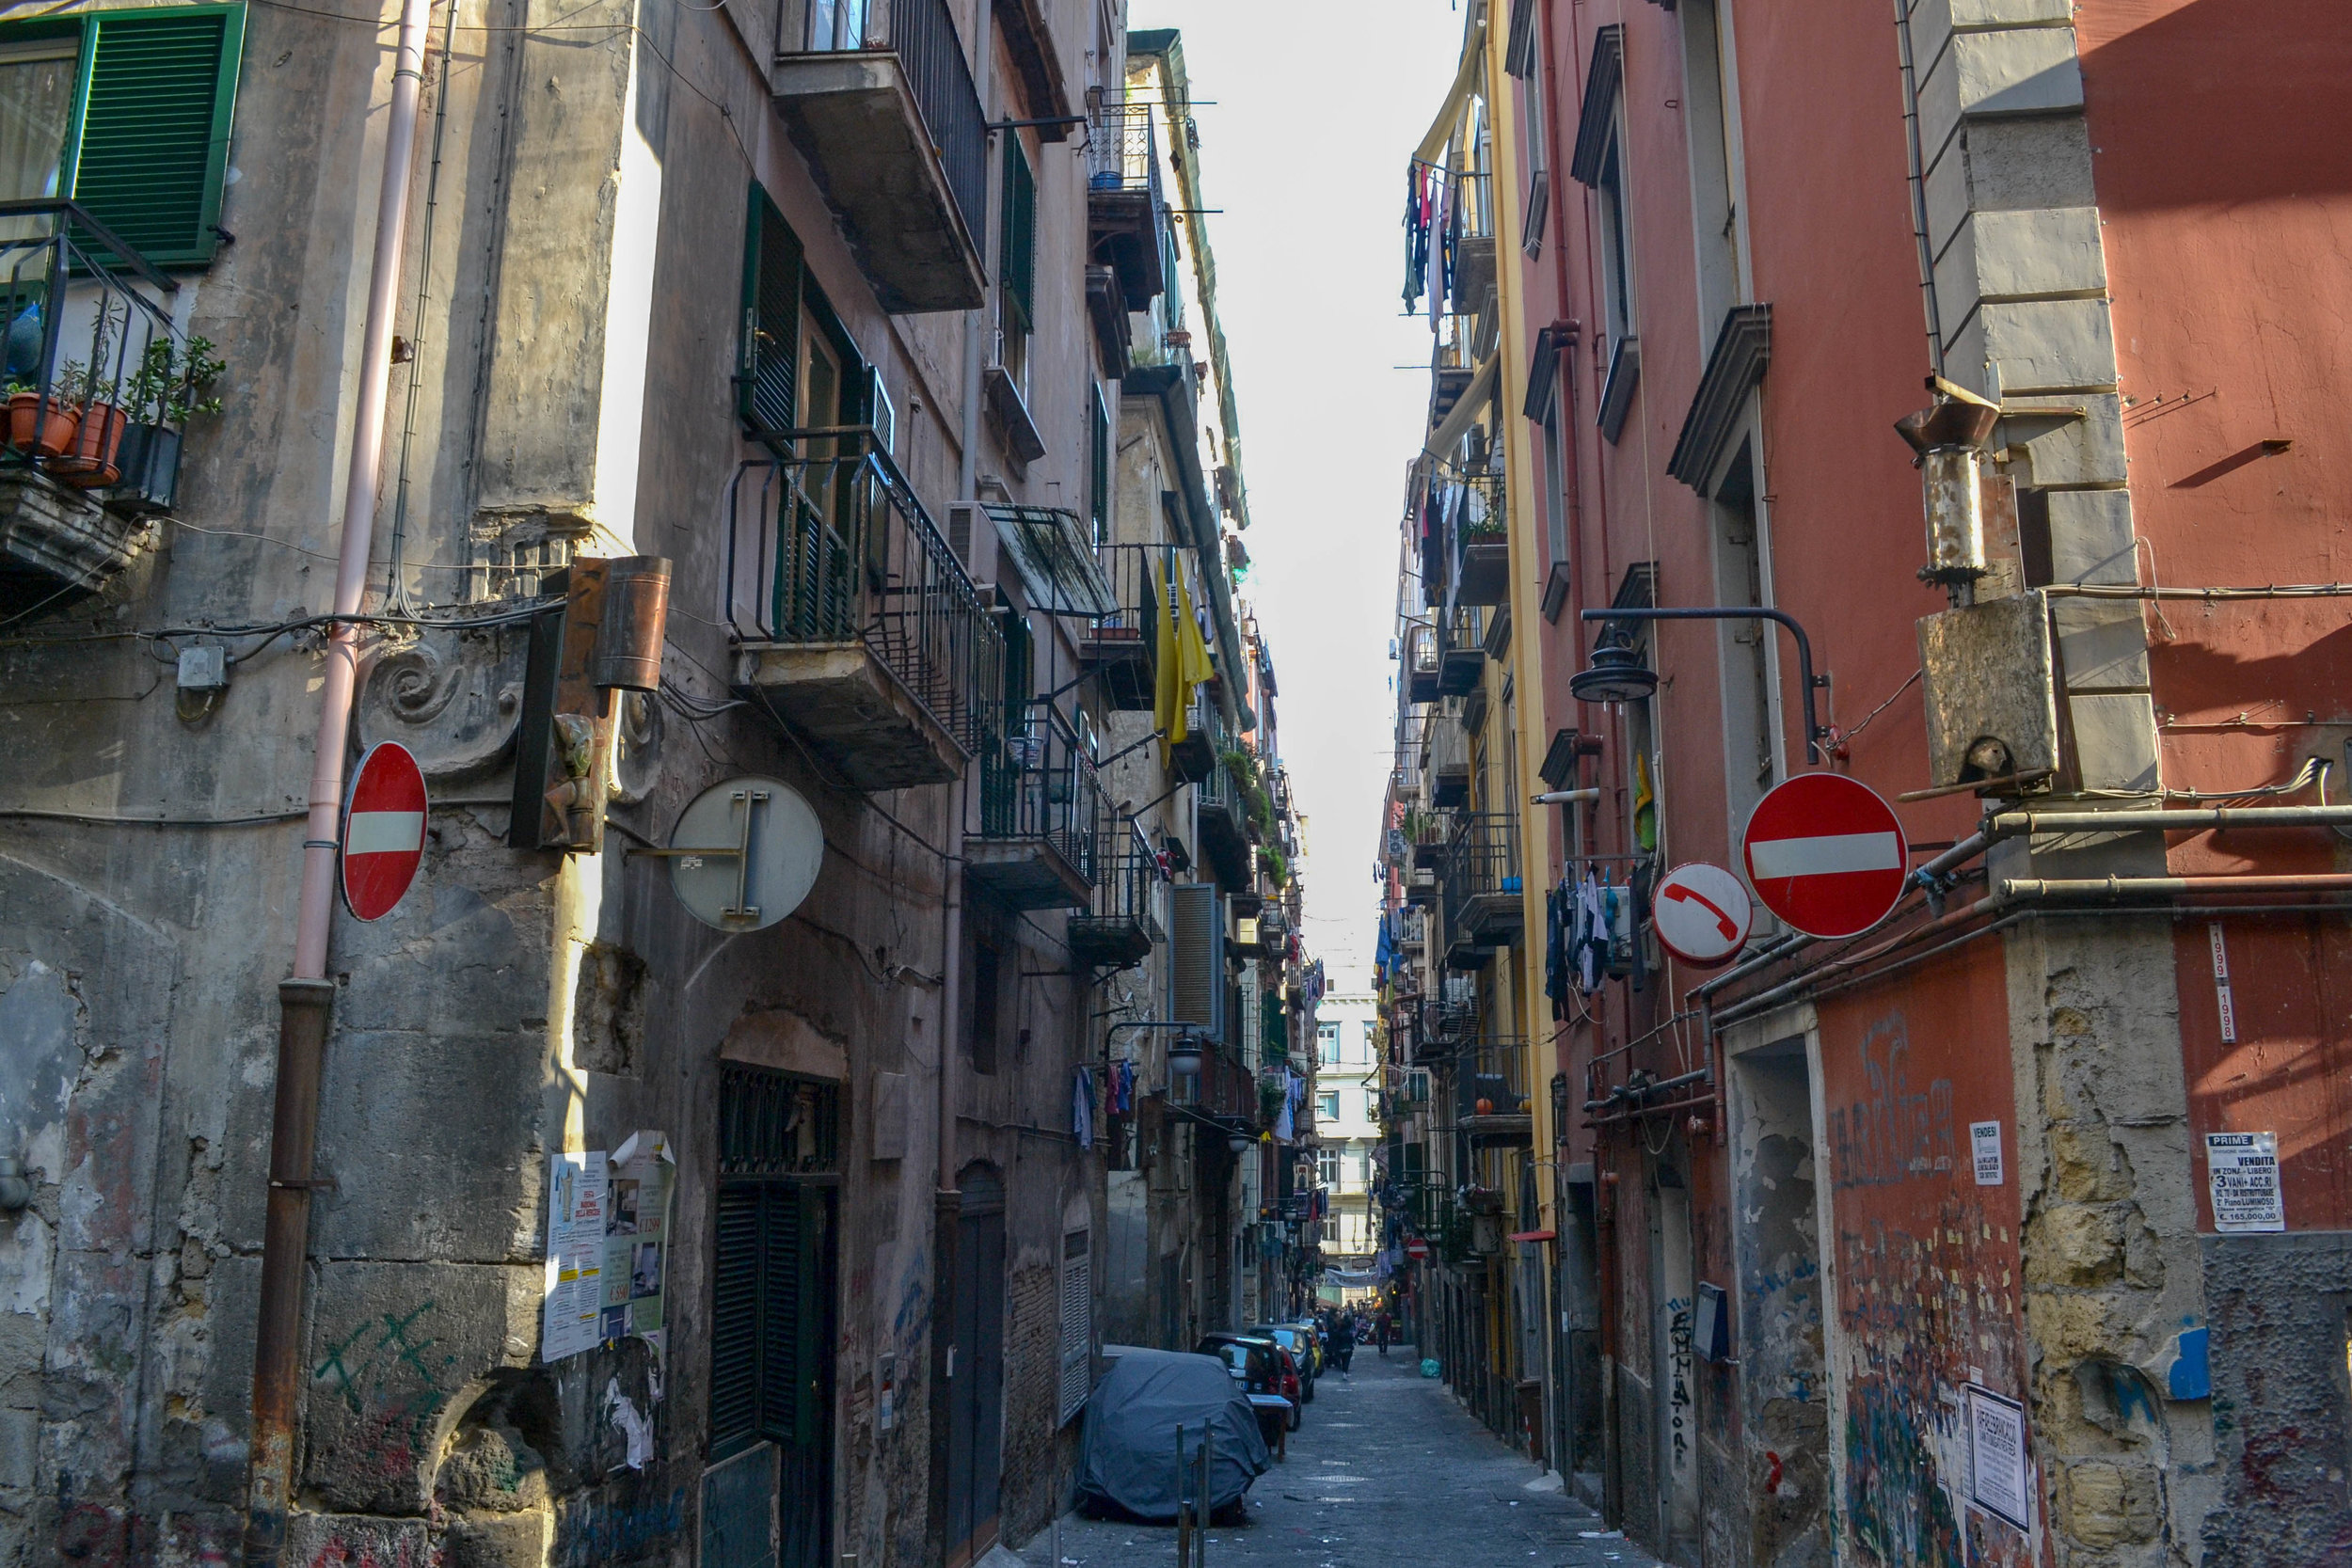 The Spanish Quarter in Naples